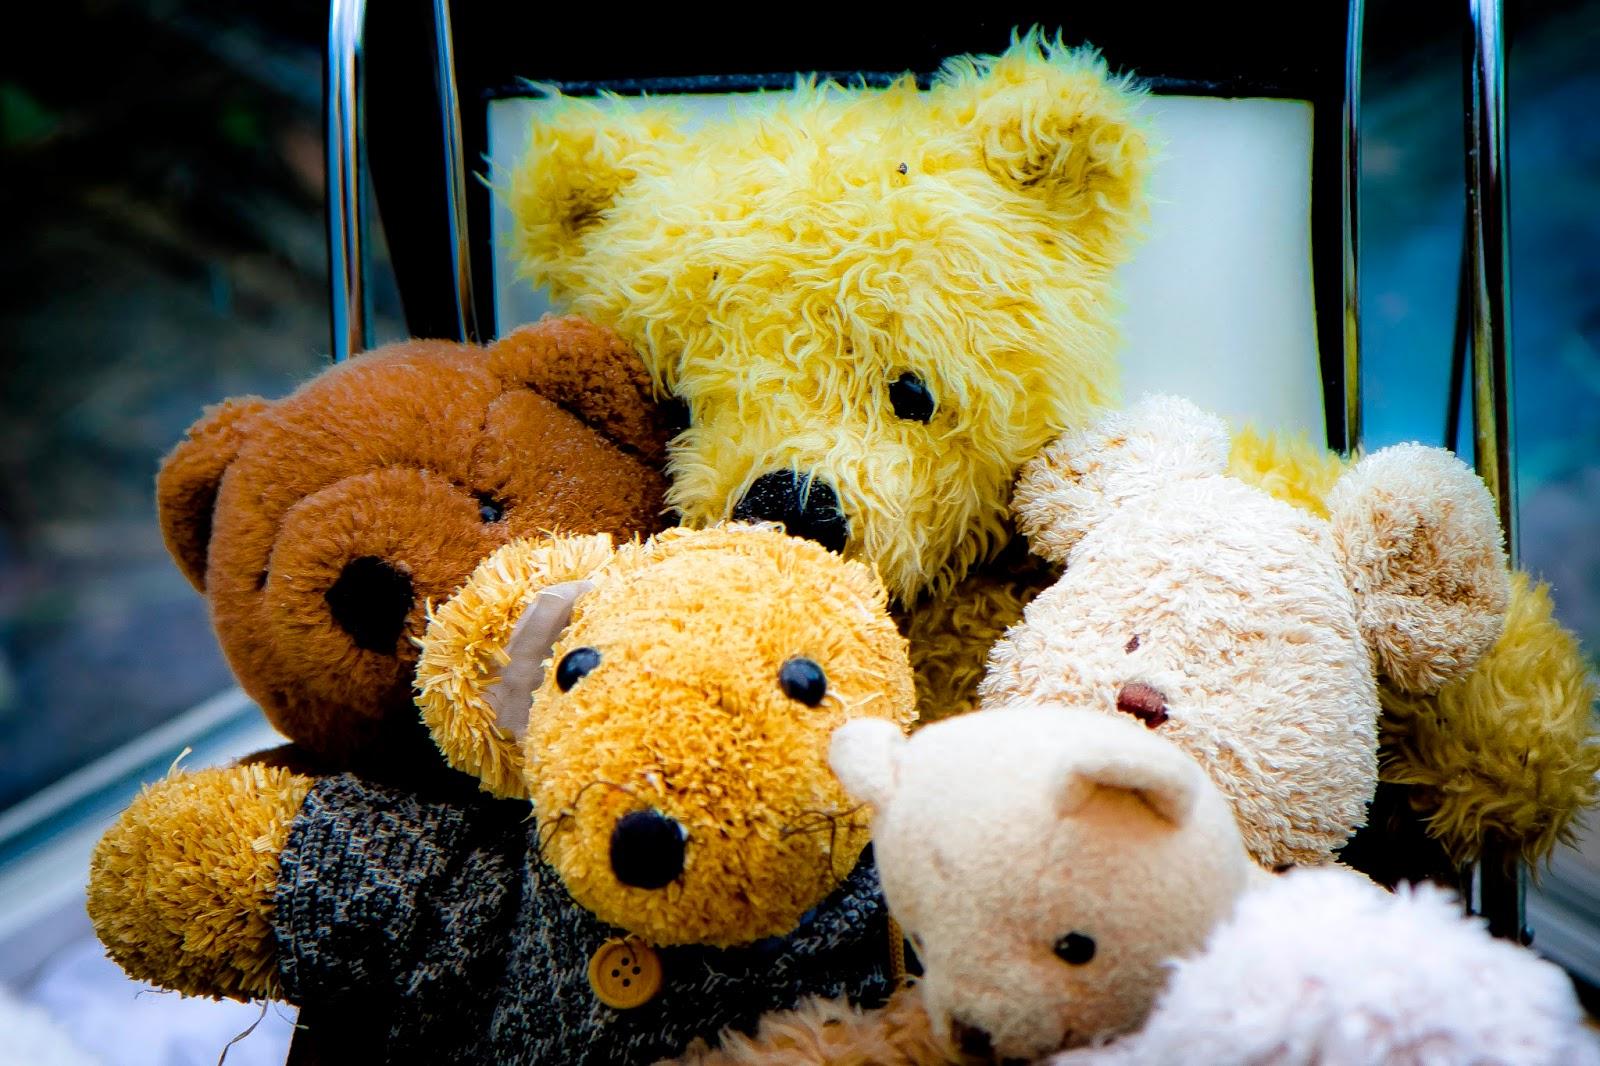 Romantic Teddy Bear Wallpapers 1600x1066